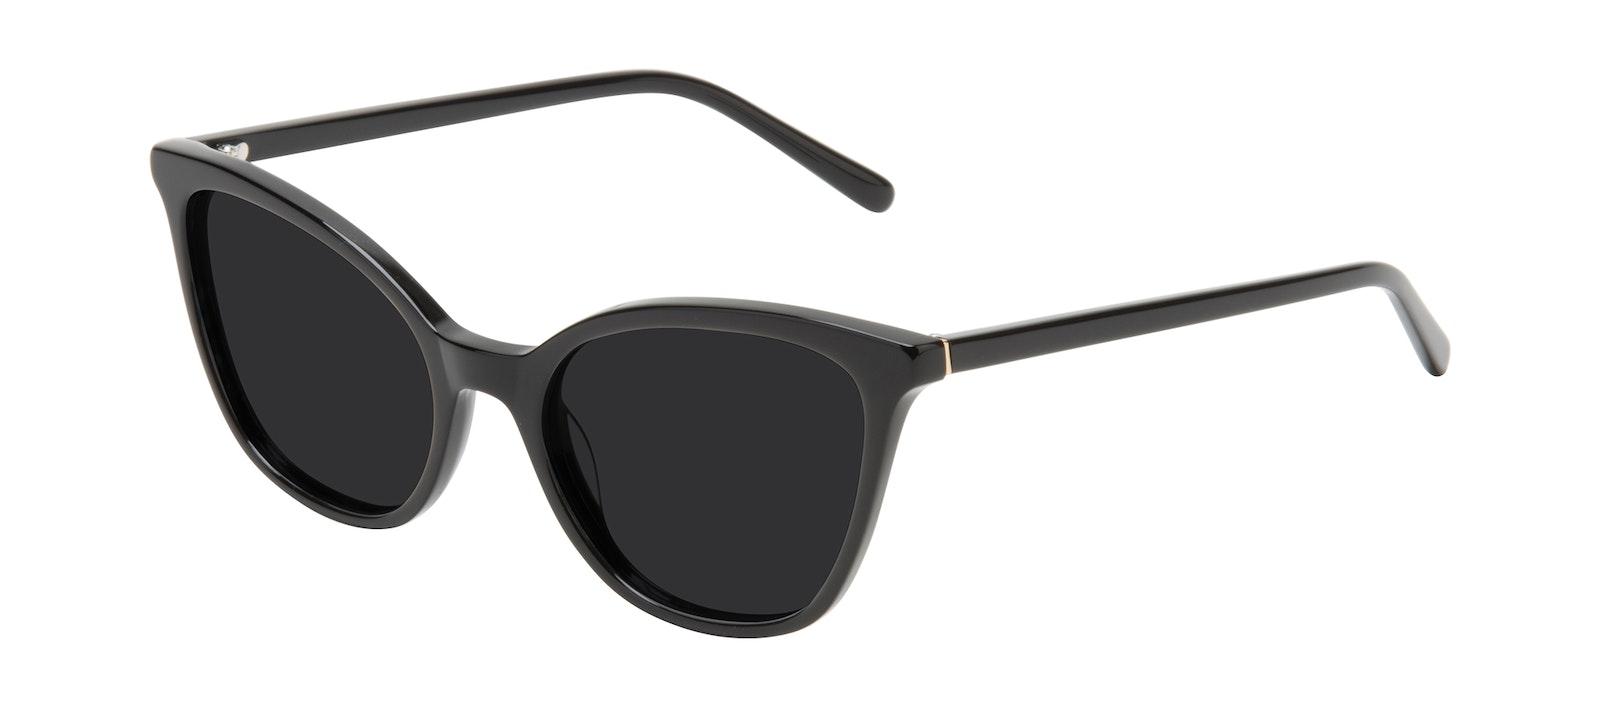 Affordable Fashion Glasses Cat Eye Sunglasses Women Tippi Onyx Tilt